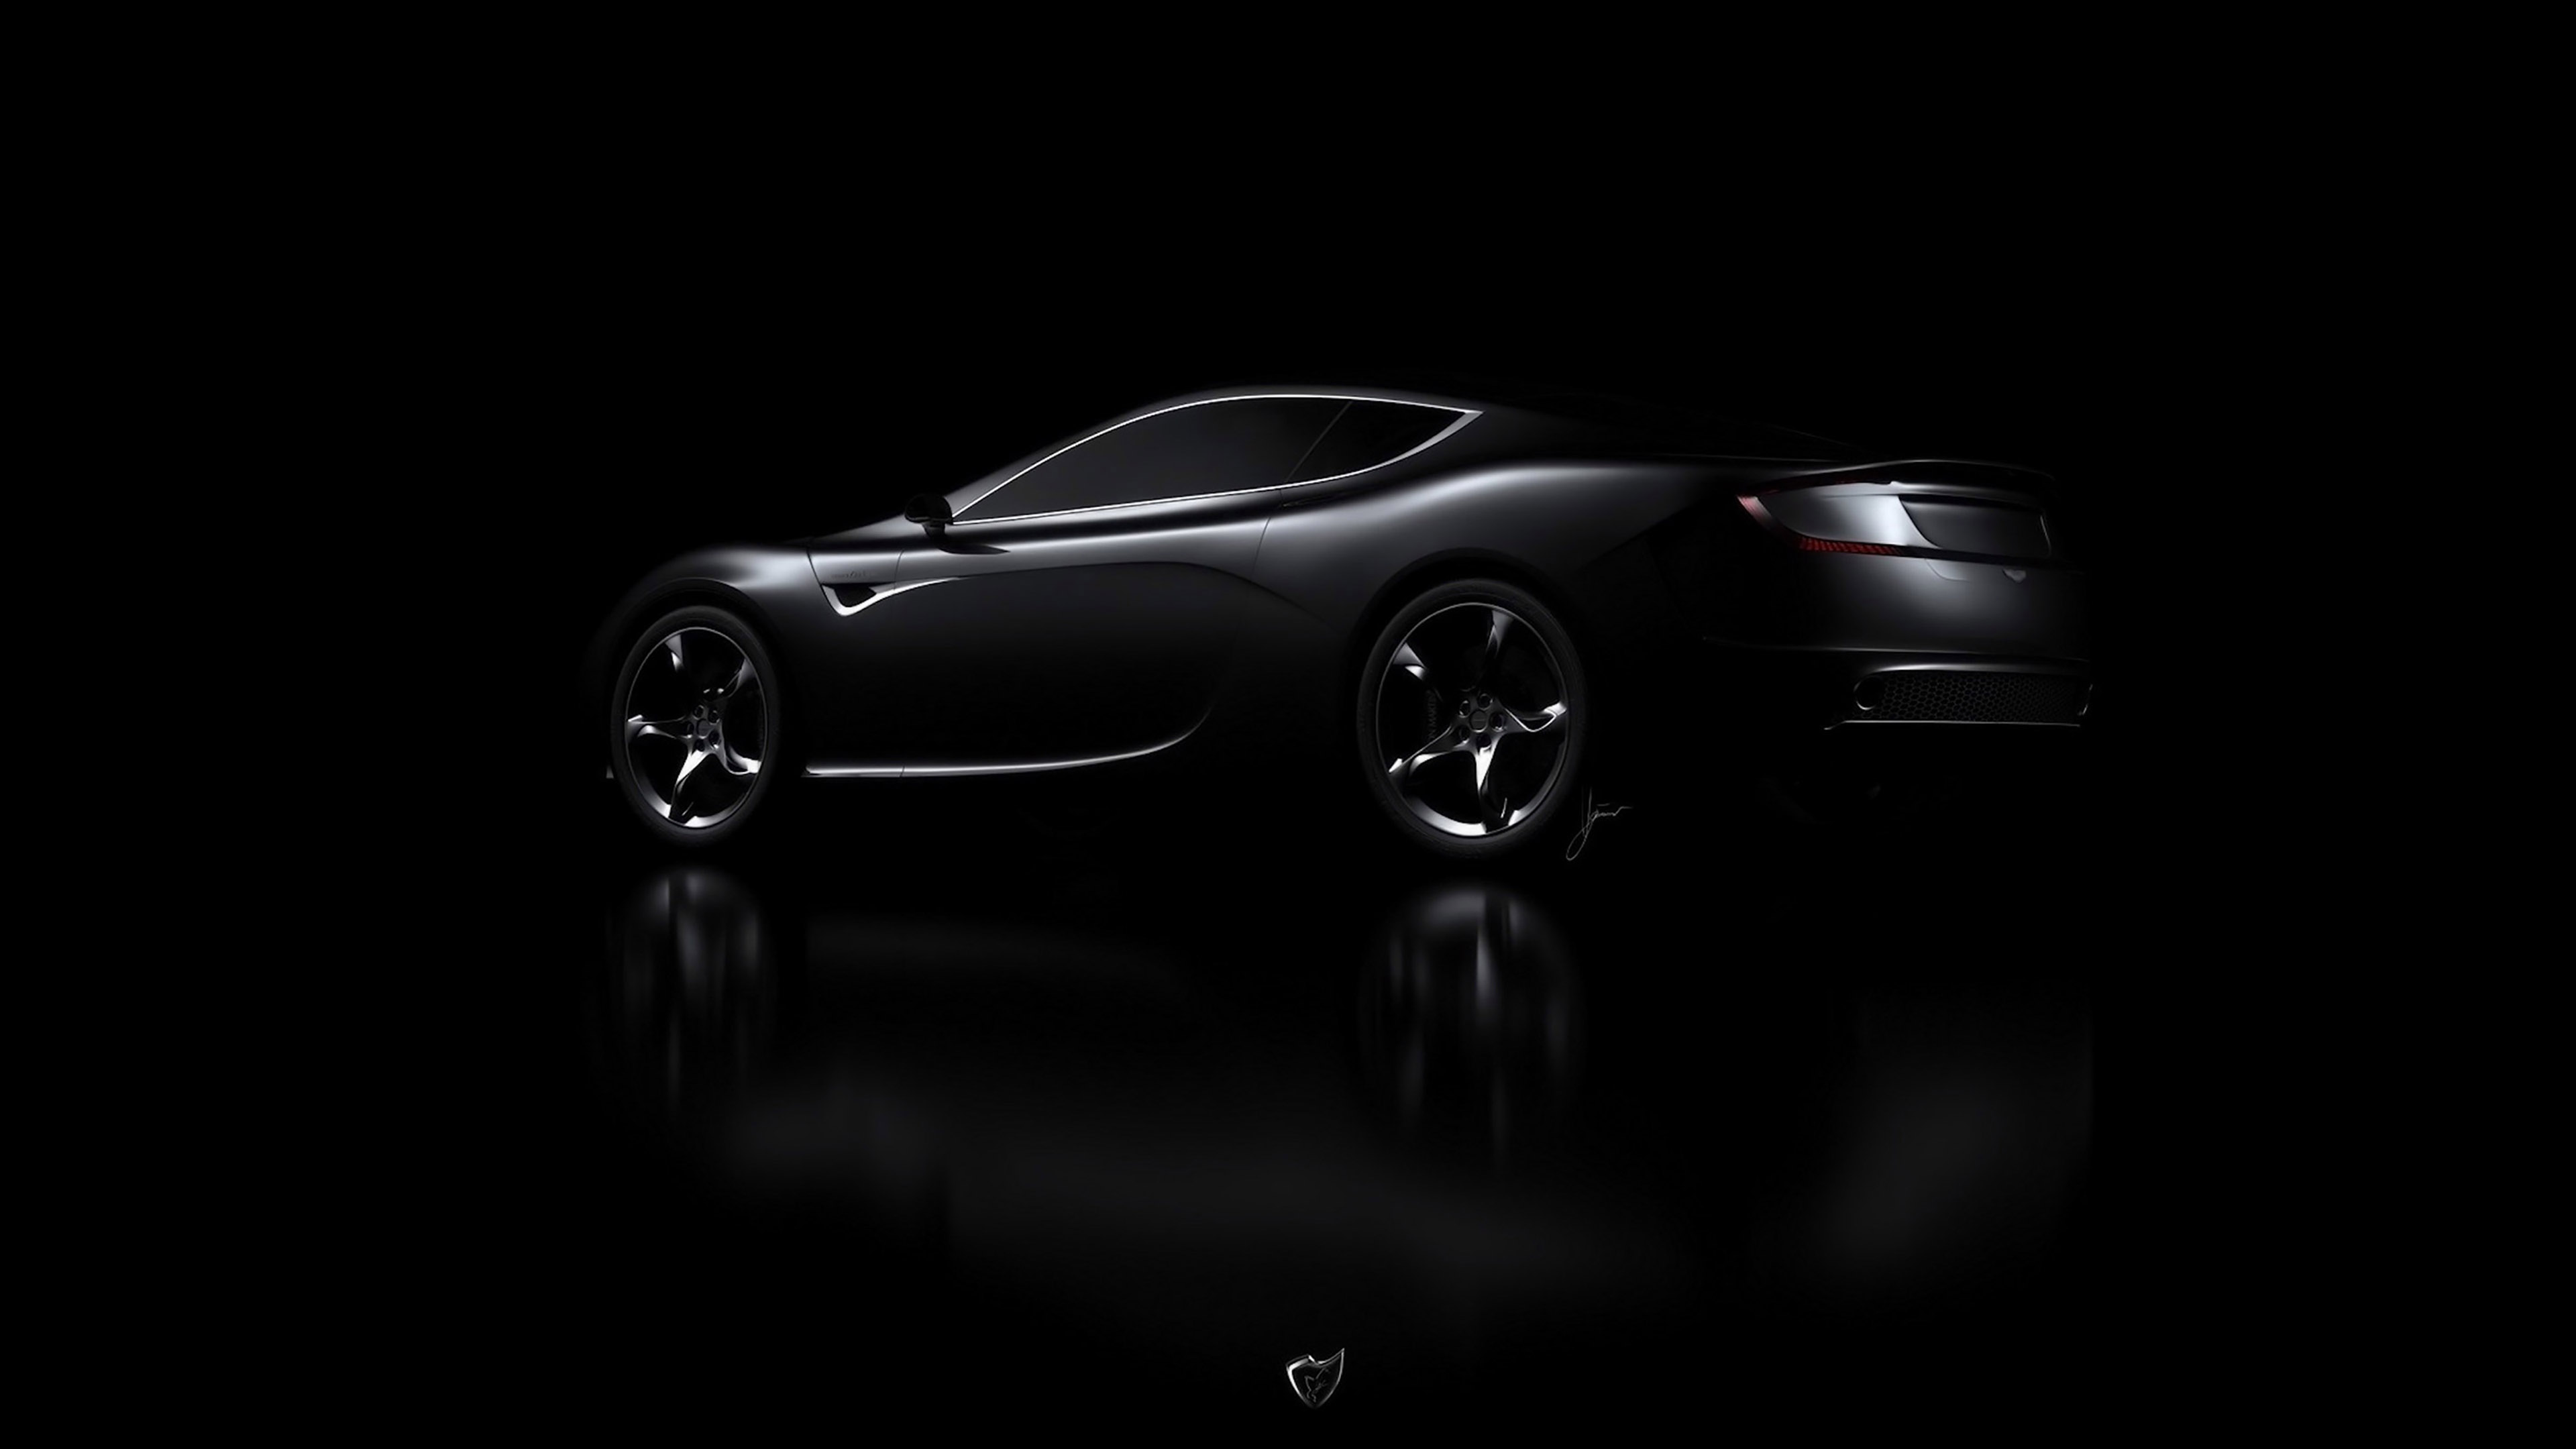 Future Car Wallpaper Minimal Aj06 Aston Martin Black Car Dark Wallpaper